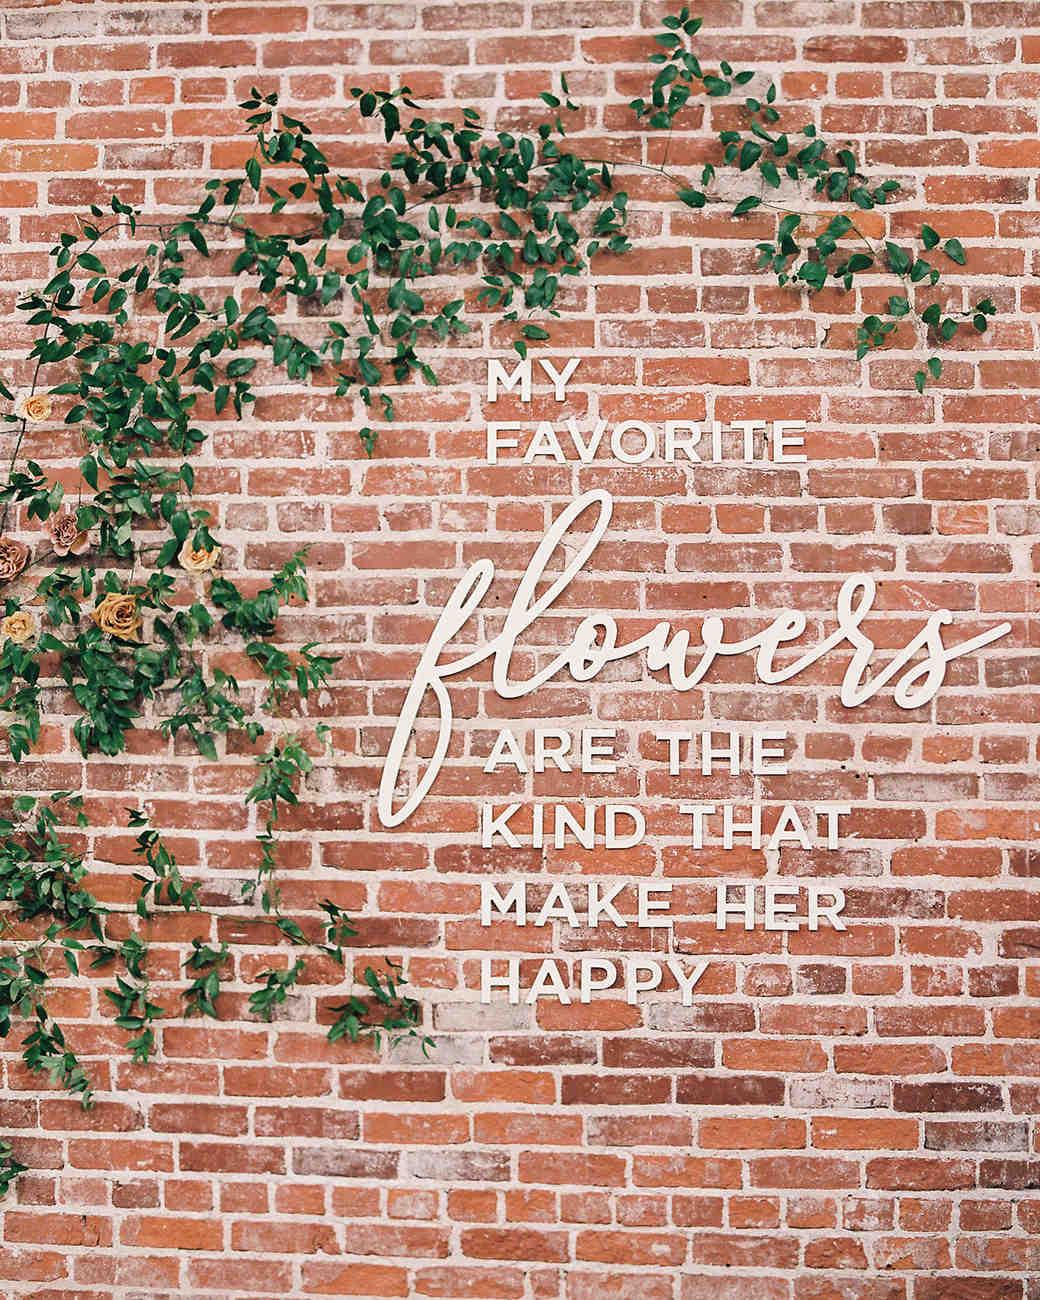 brooke dalton wedding quote on brick wall